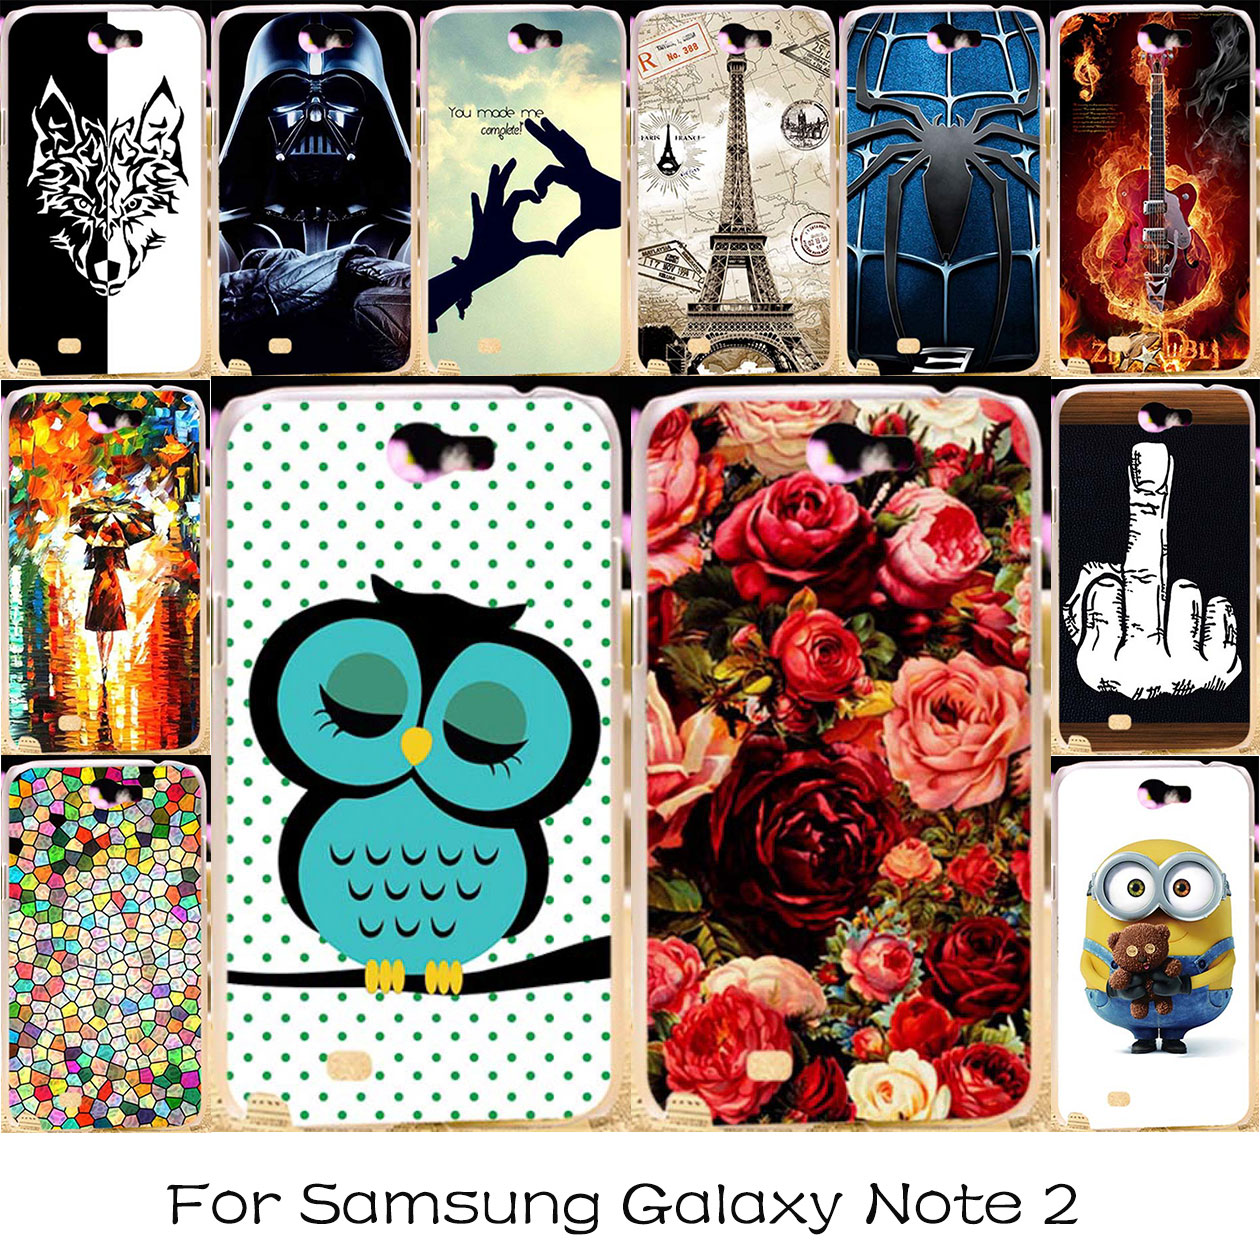 TAOYUNXI Phone Case For Samsung Galaxy Note 2 II N7100 Housing Cover N7105 Note2 7100 NoteII Plastic Bag Shell Skin Cover